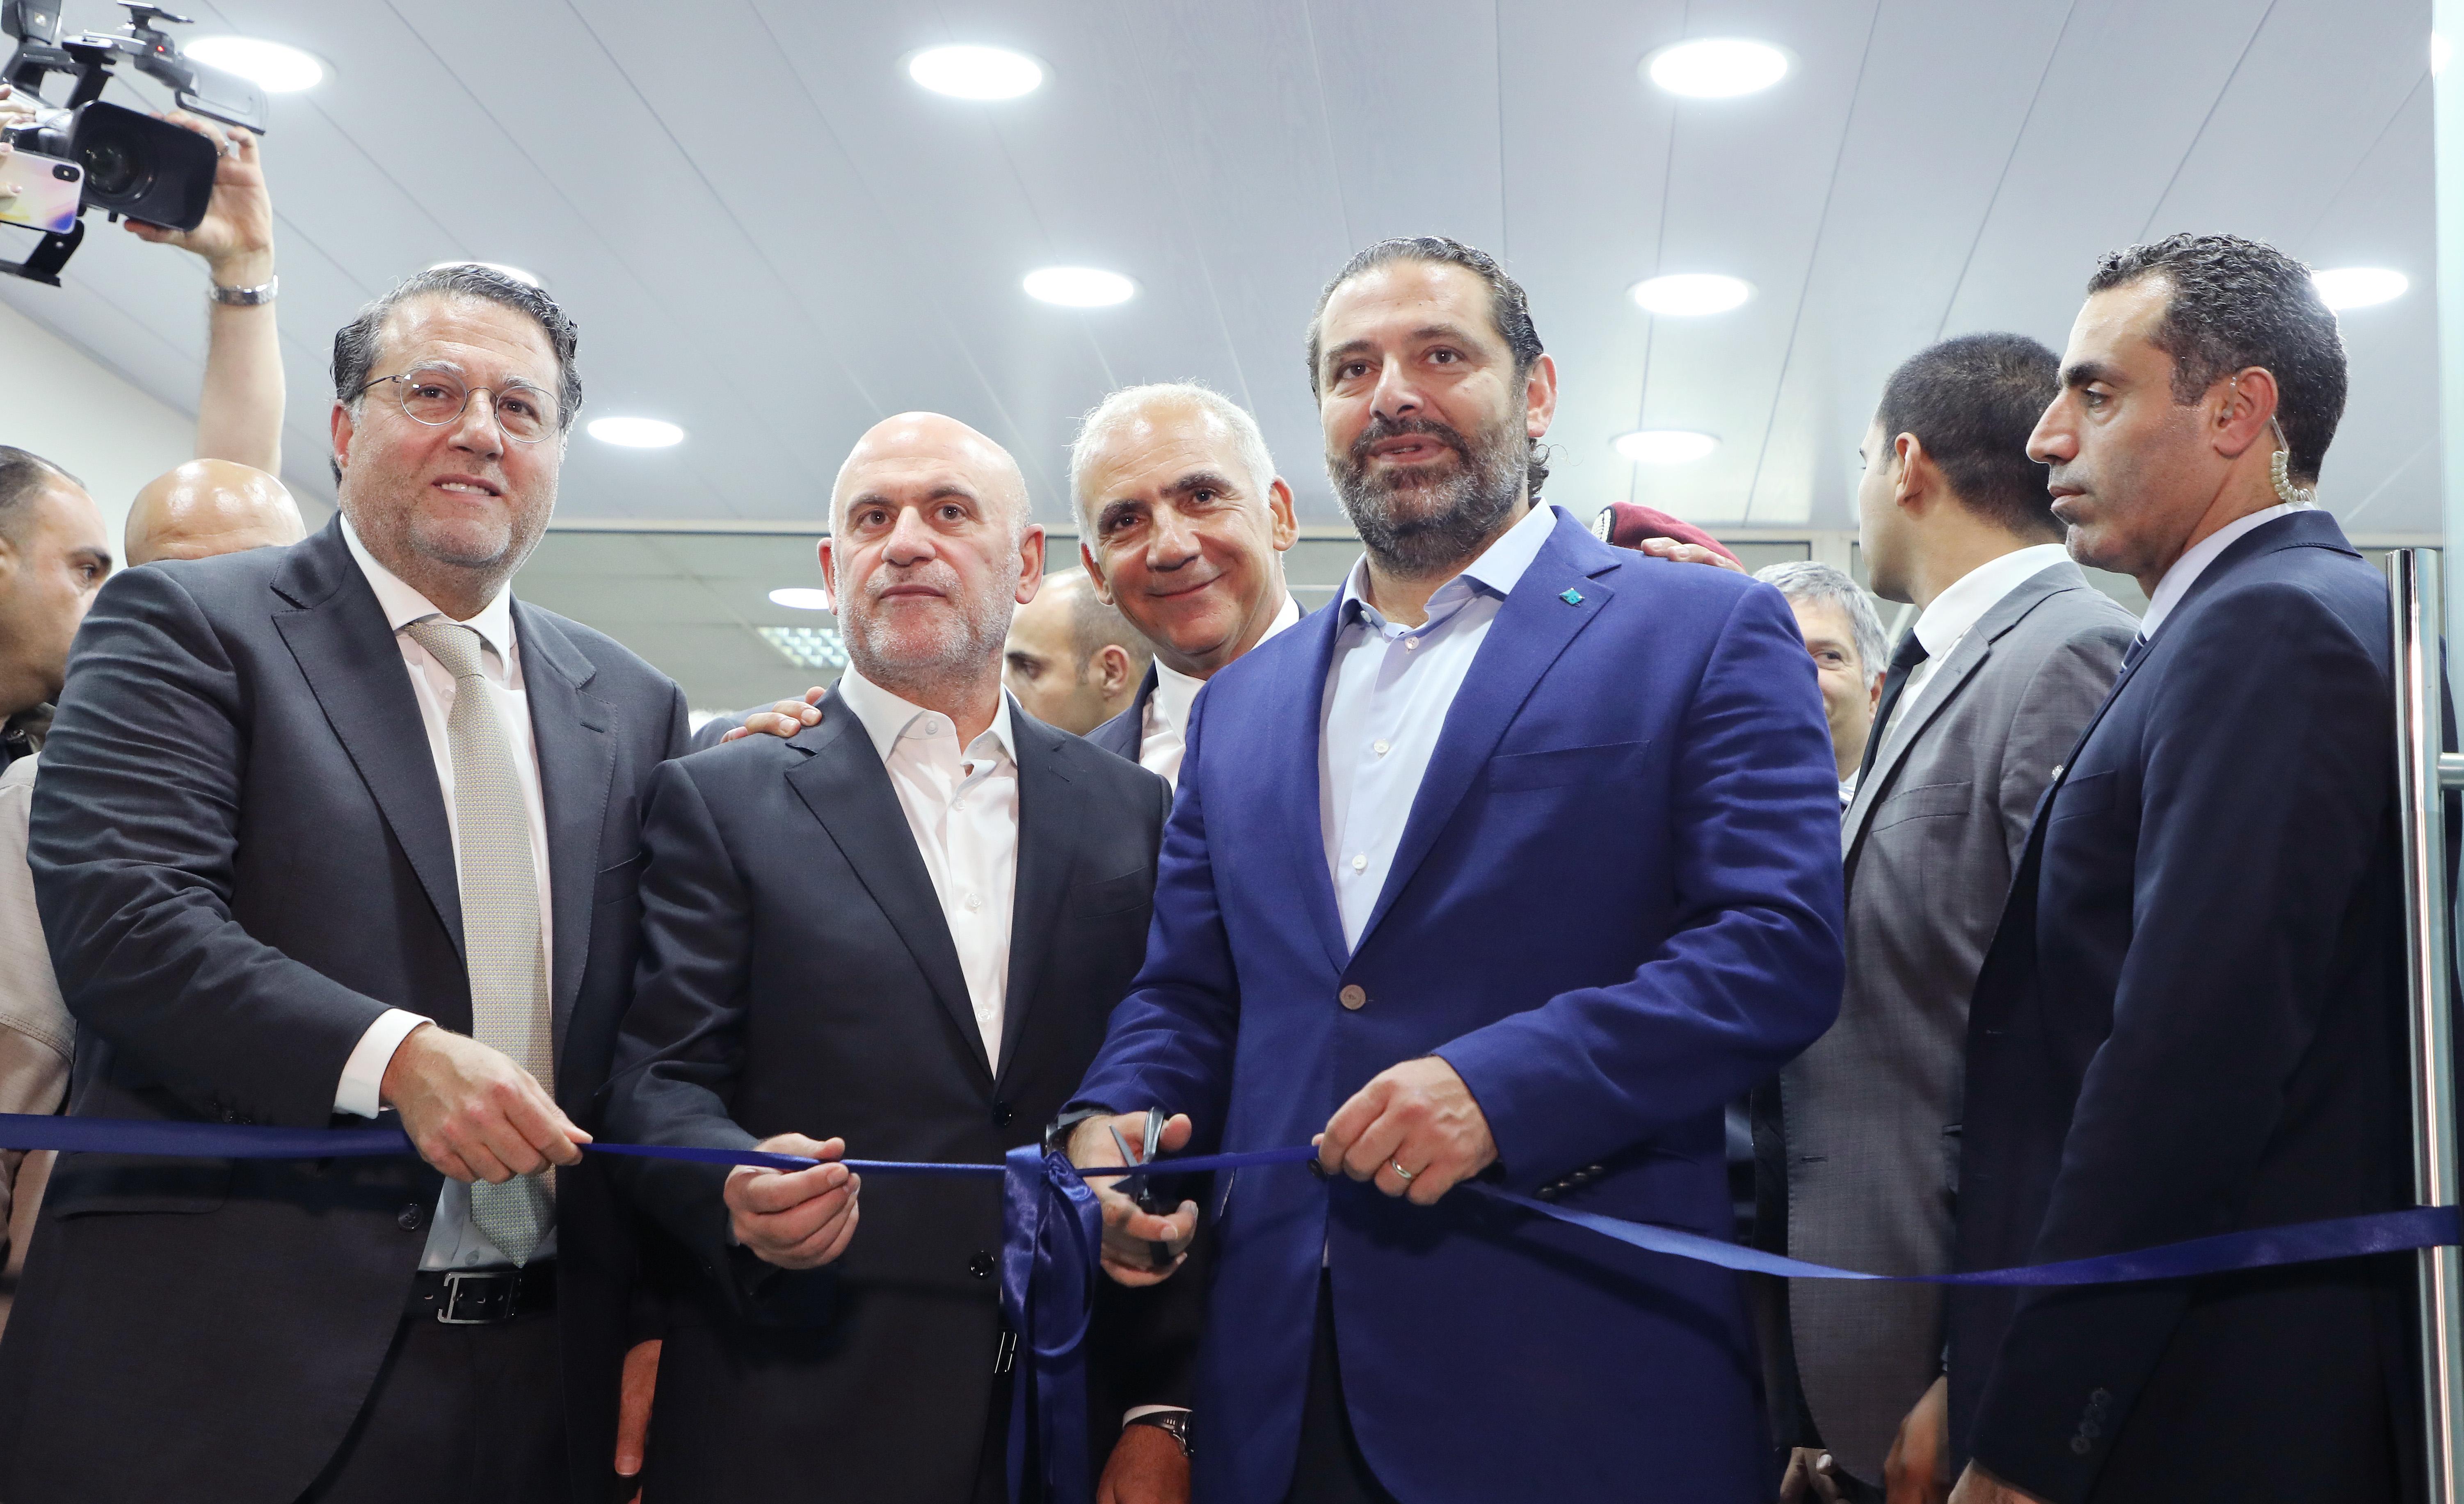 Pr Minister Saad Hariri Visits Beirut Ports 10